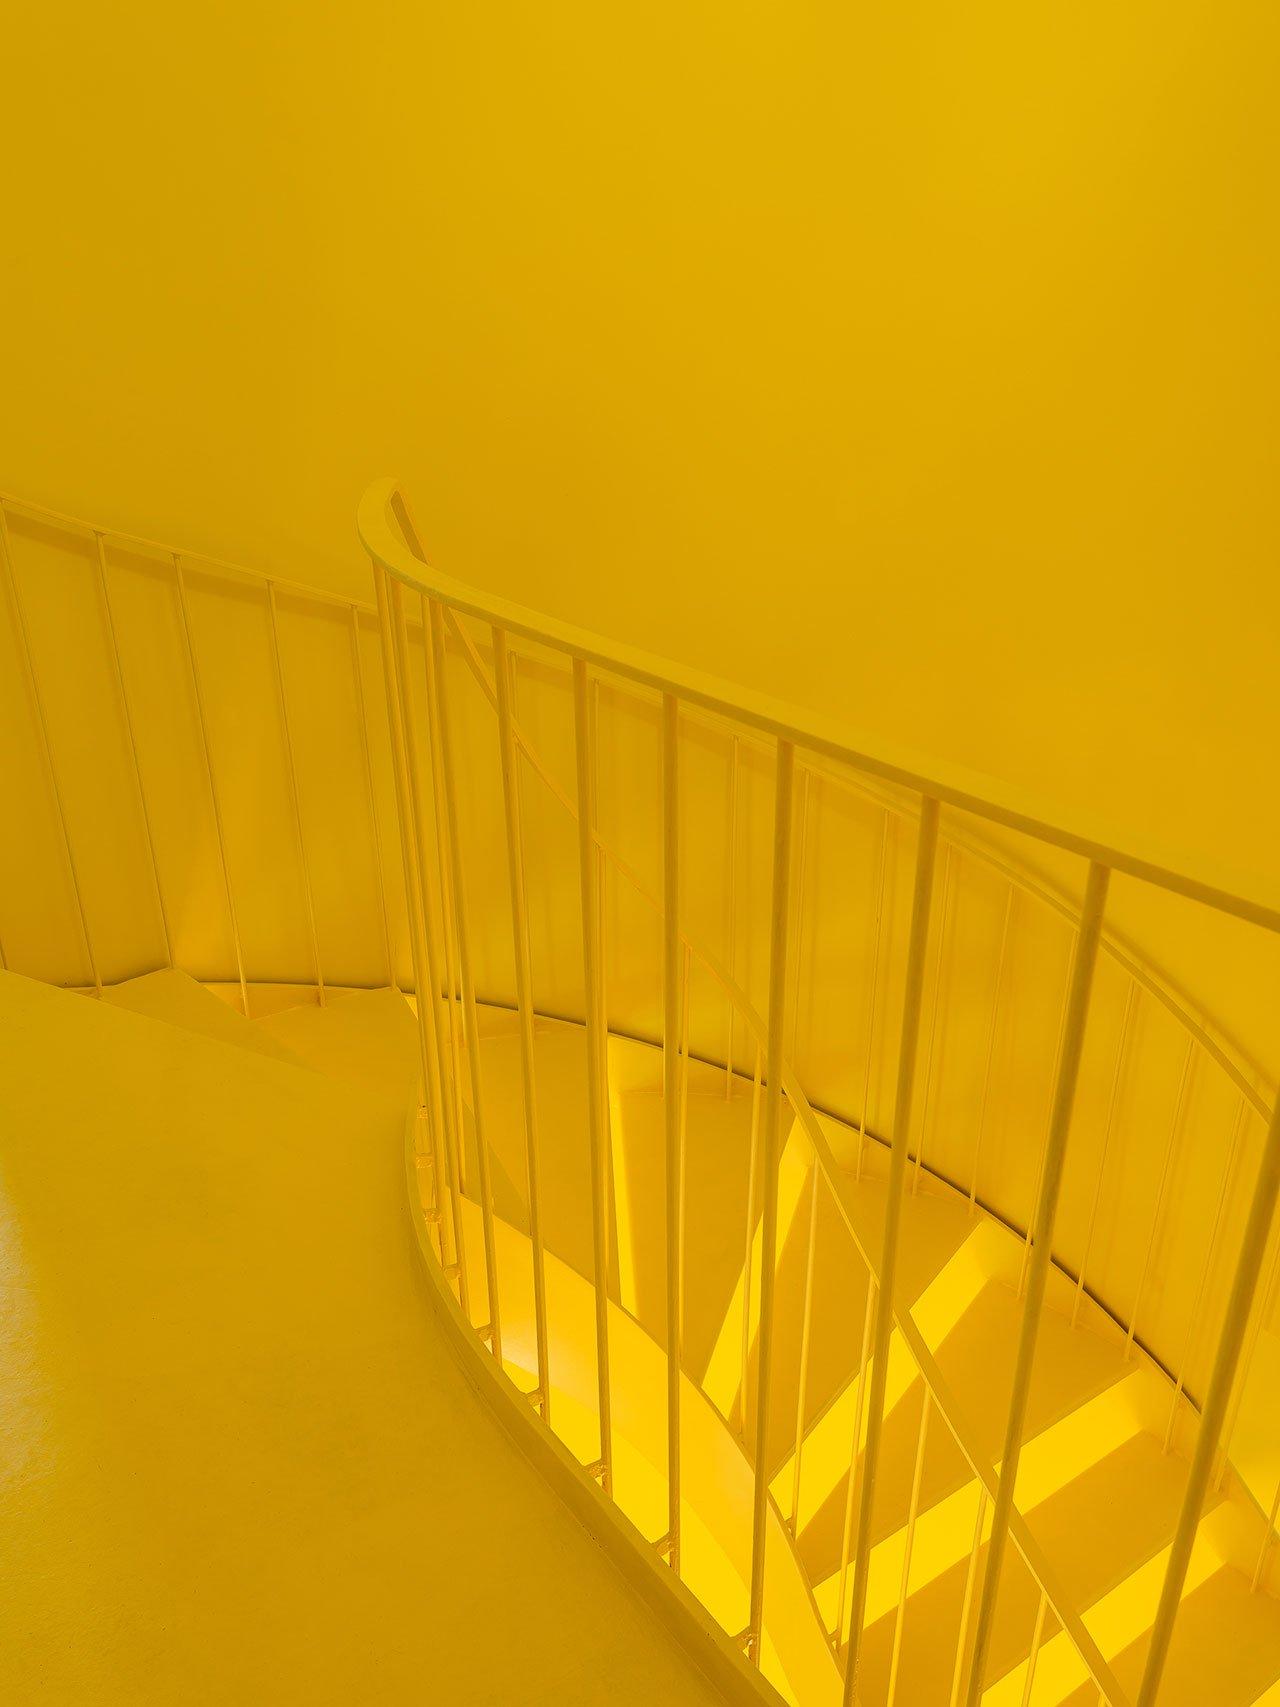 s5_hostel_in_parede_cascais_portugal_aurora_arquitectos_photo_do_mal_o_menos_yatzer.jpg